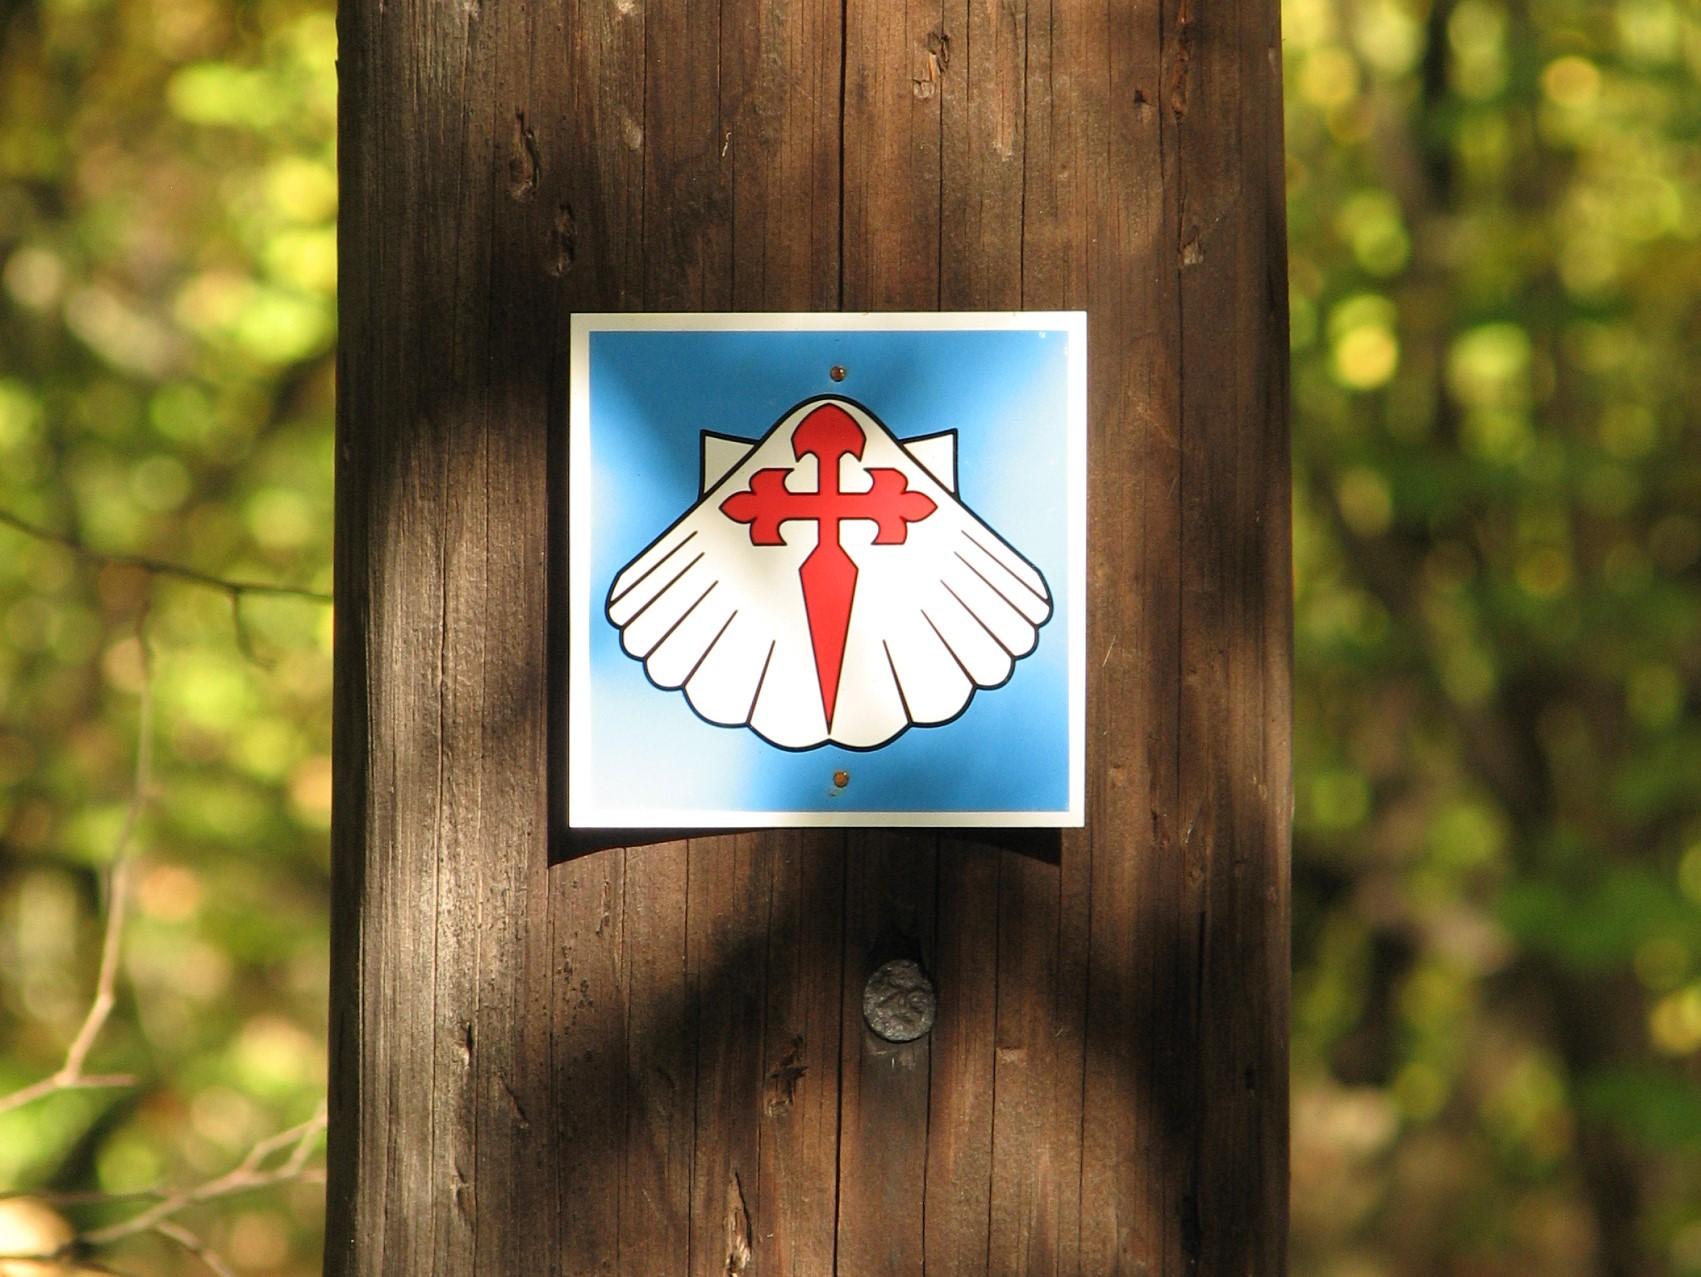 wielkopolska droga świętego jakuba - Michal-100 - Wikipedia